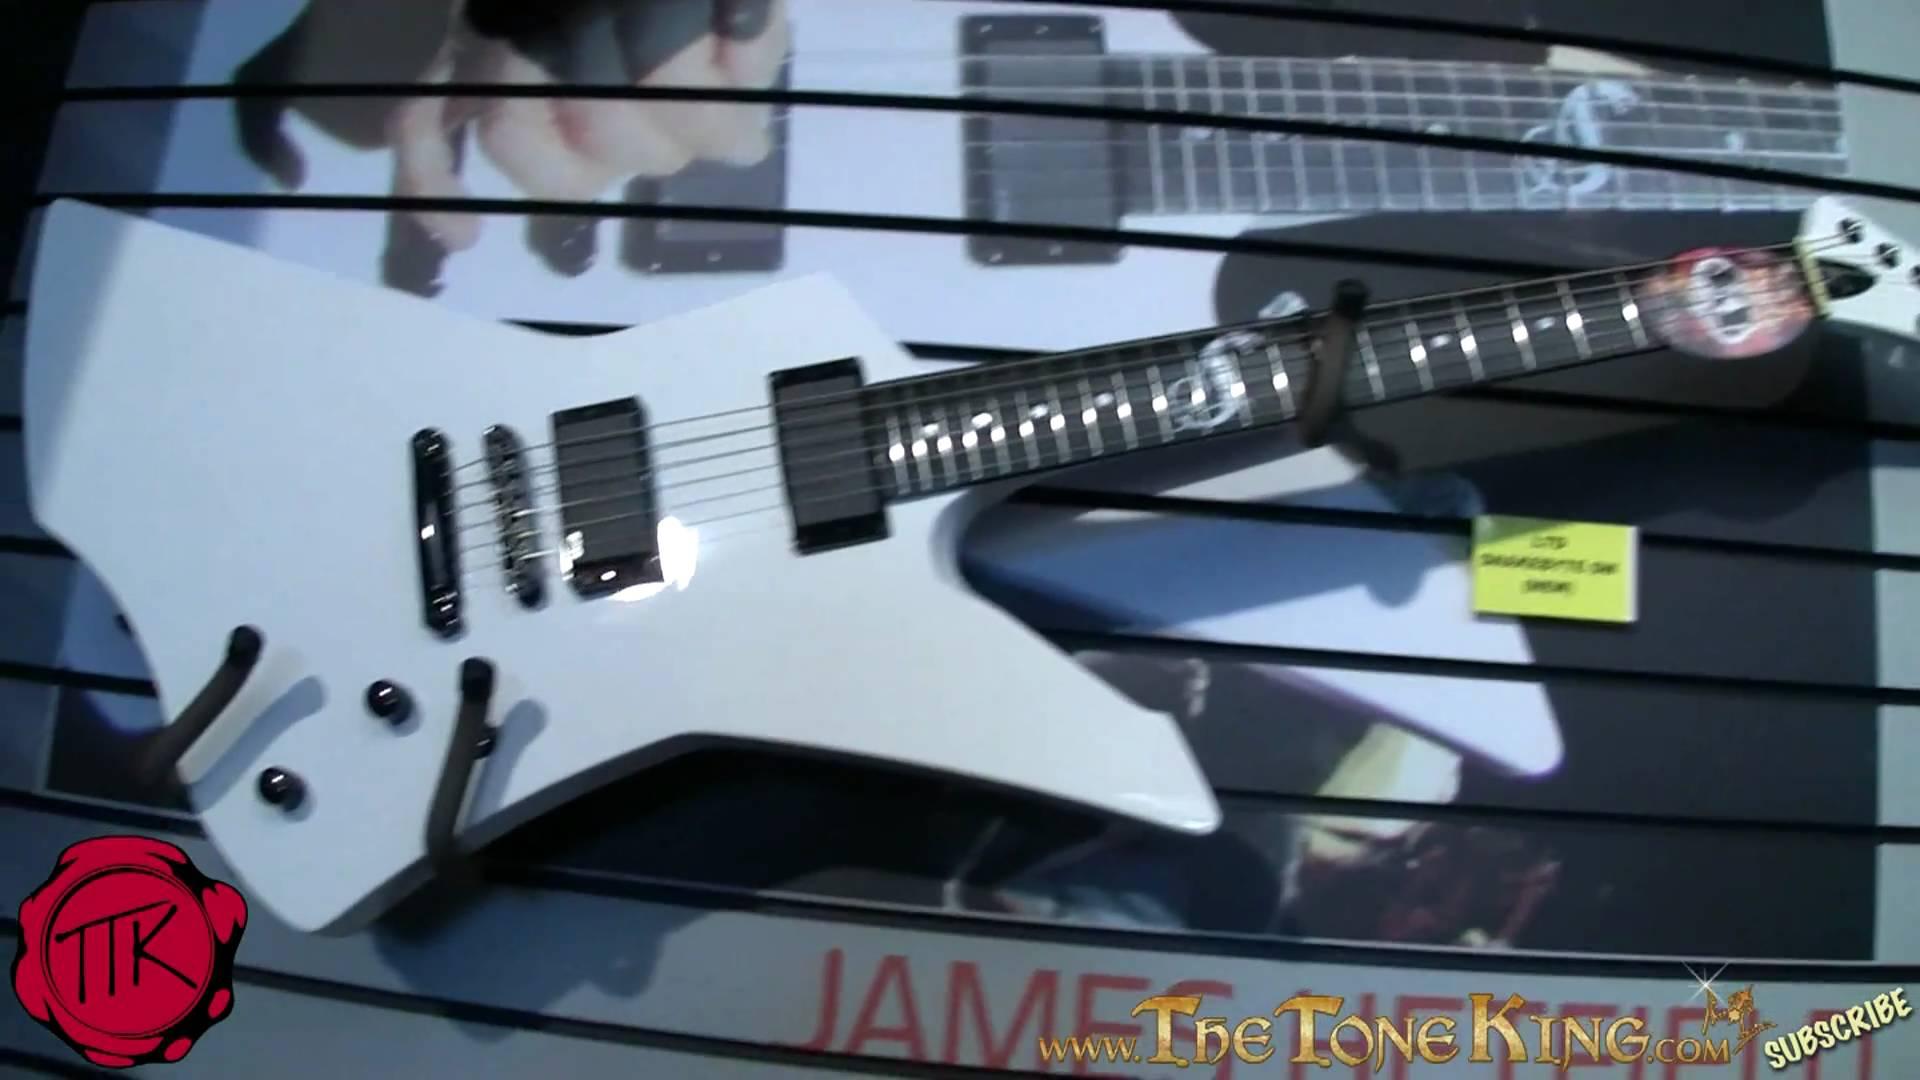 esp ltd snakebyte guitar in hd 1080 metallicas james hetfield new signature series axe 2 youtube thumbnail?fit=1200%2C675&resize=350%2C200 esp ltd kh wiring diagram custom esp kh, esp kh dc, esp kh 4 Schecter Guitar Wiring Diagrams at aneh.co